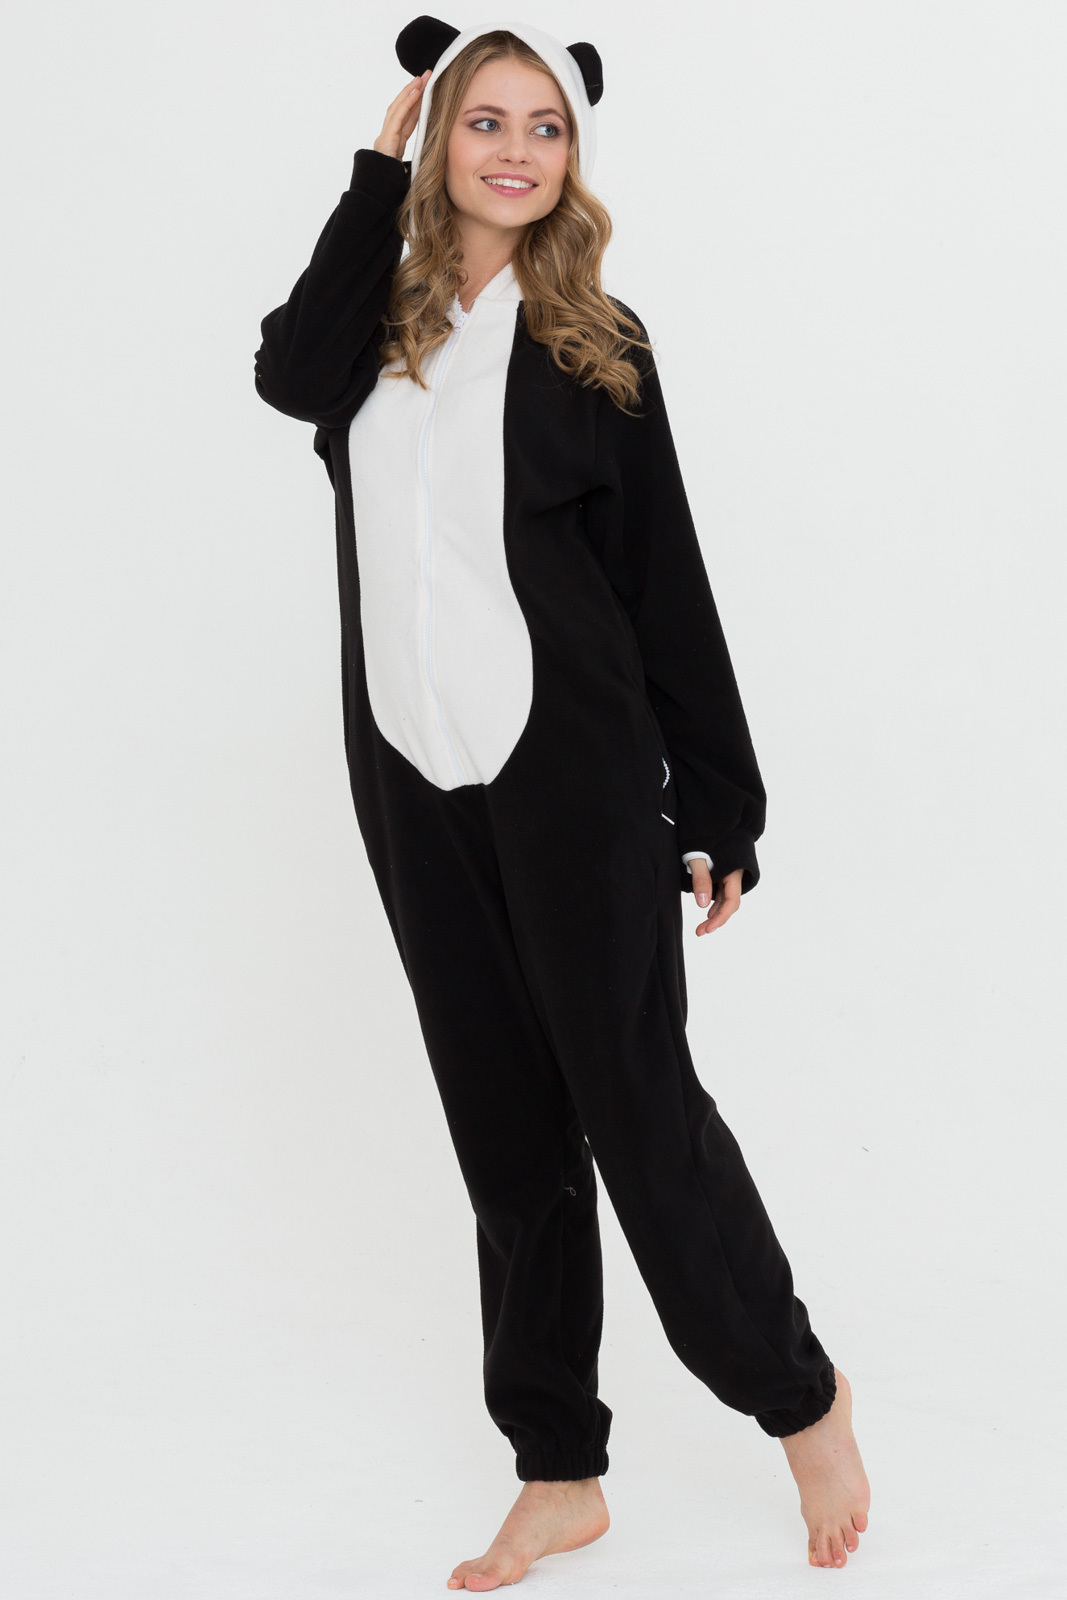 Женская пижама «Панда» (41 фото)  для девушек 4f7ab5cf0745e